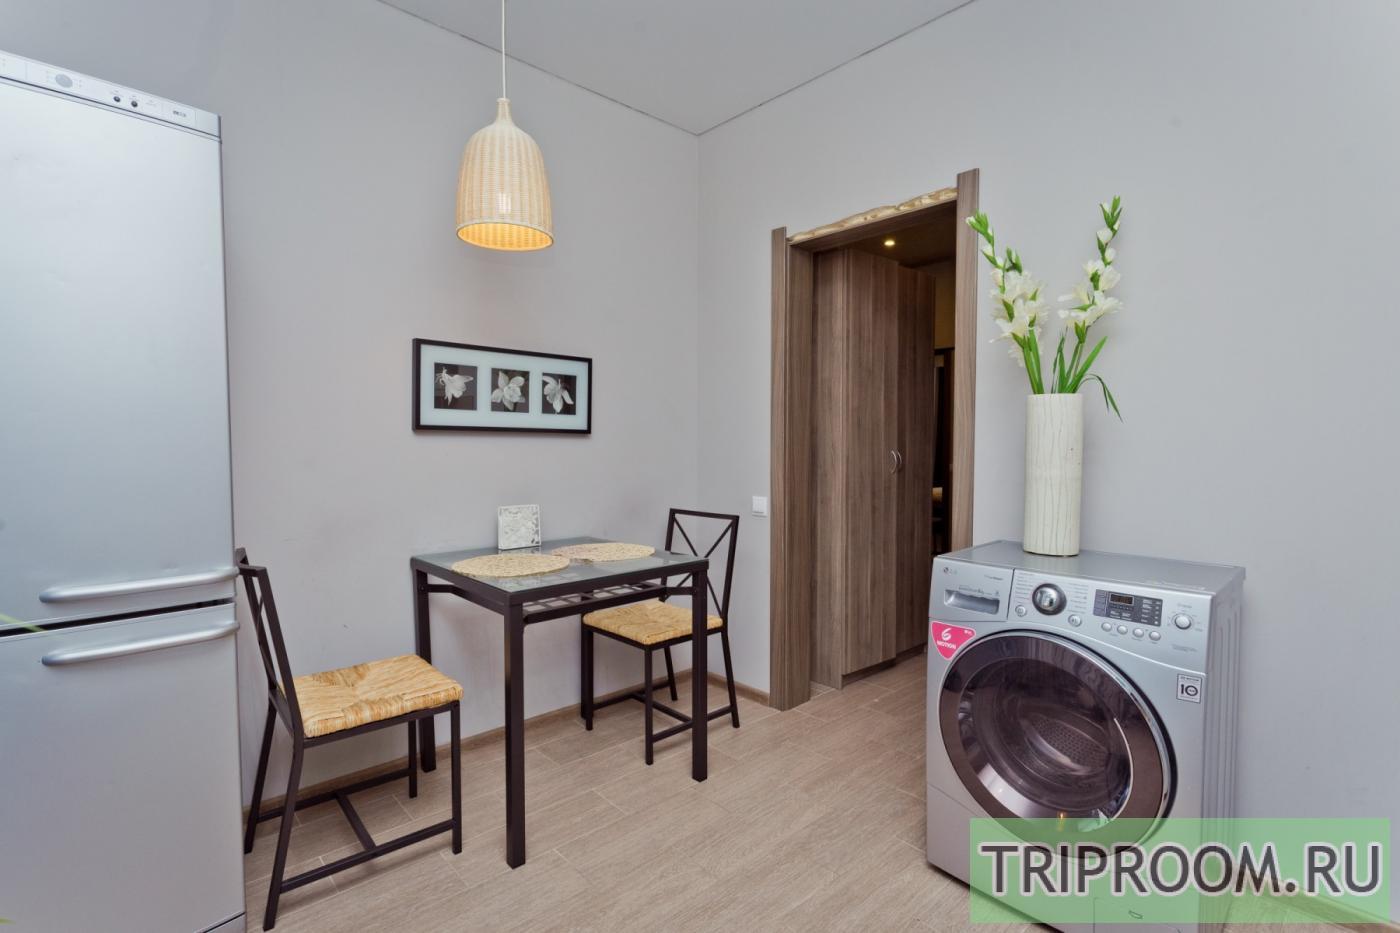 2-комнатная квартира посуточно (вариант № 26145), ул. Звездинка улица, фото № 7